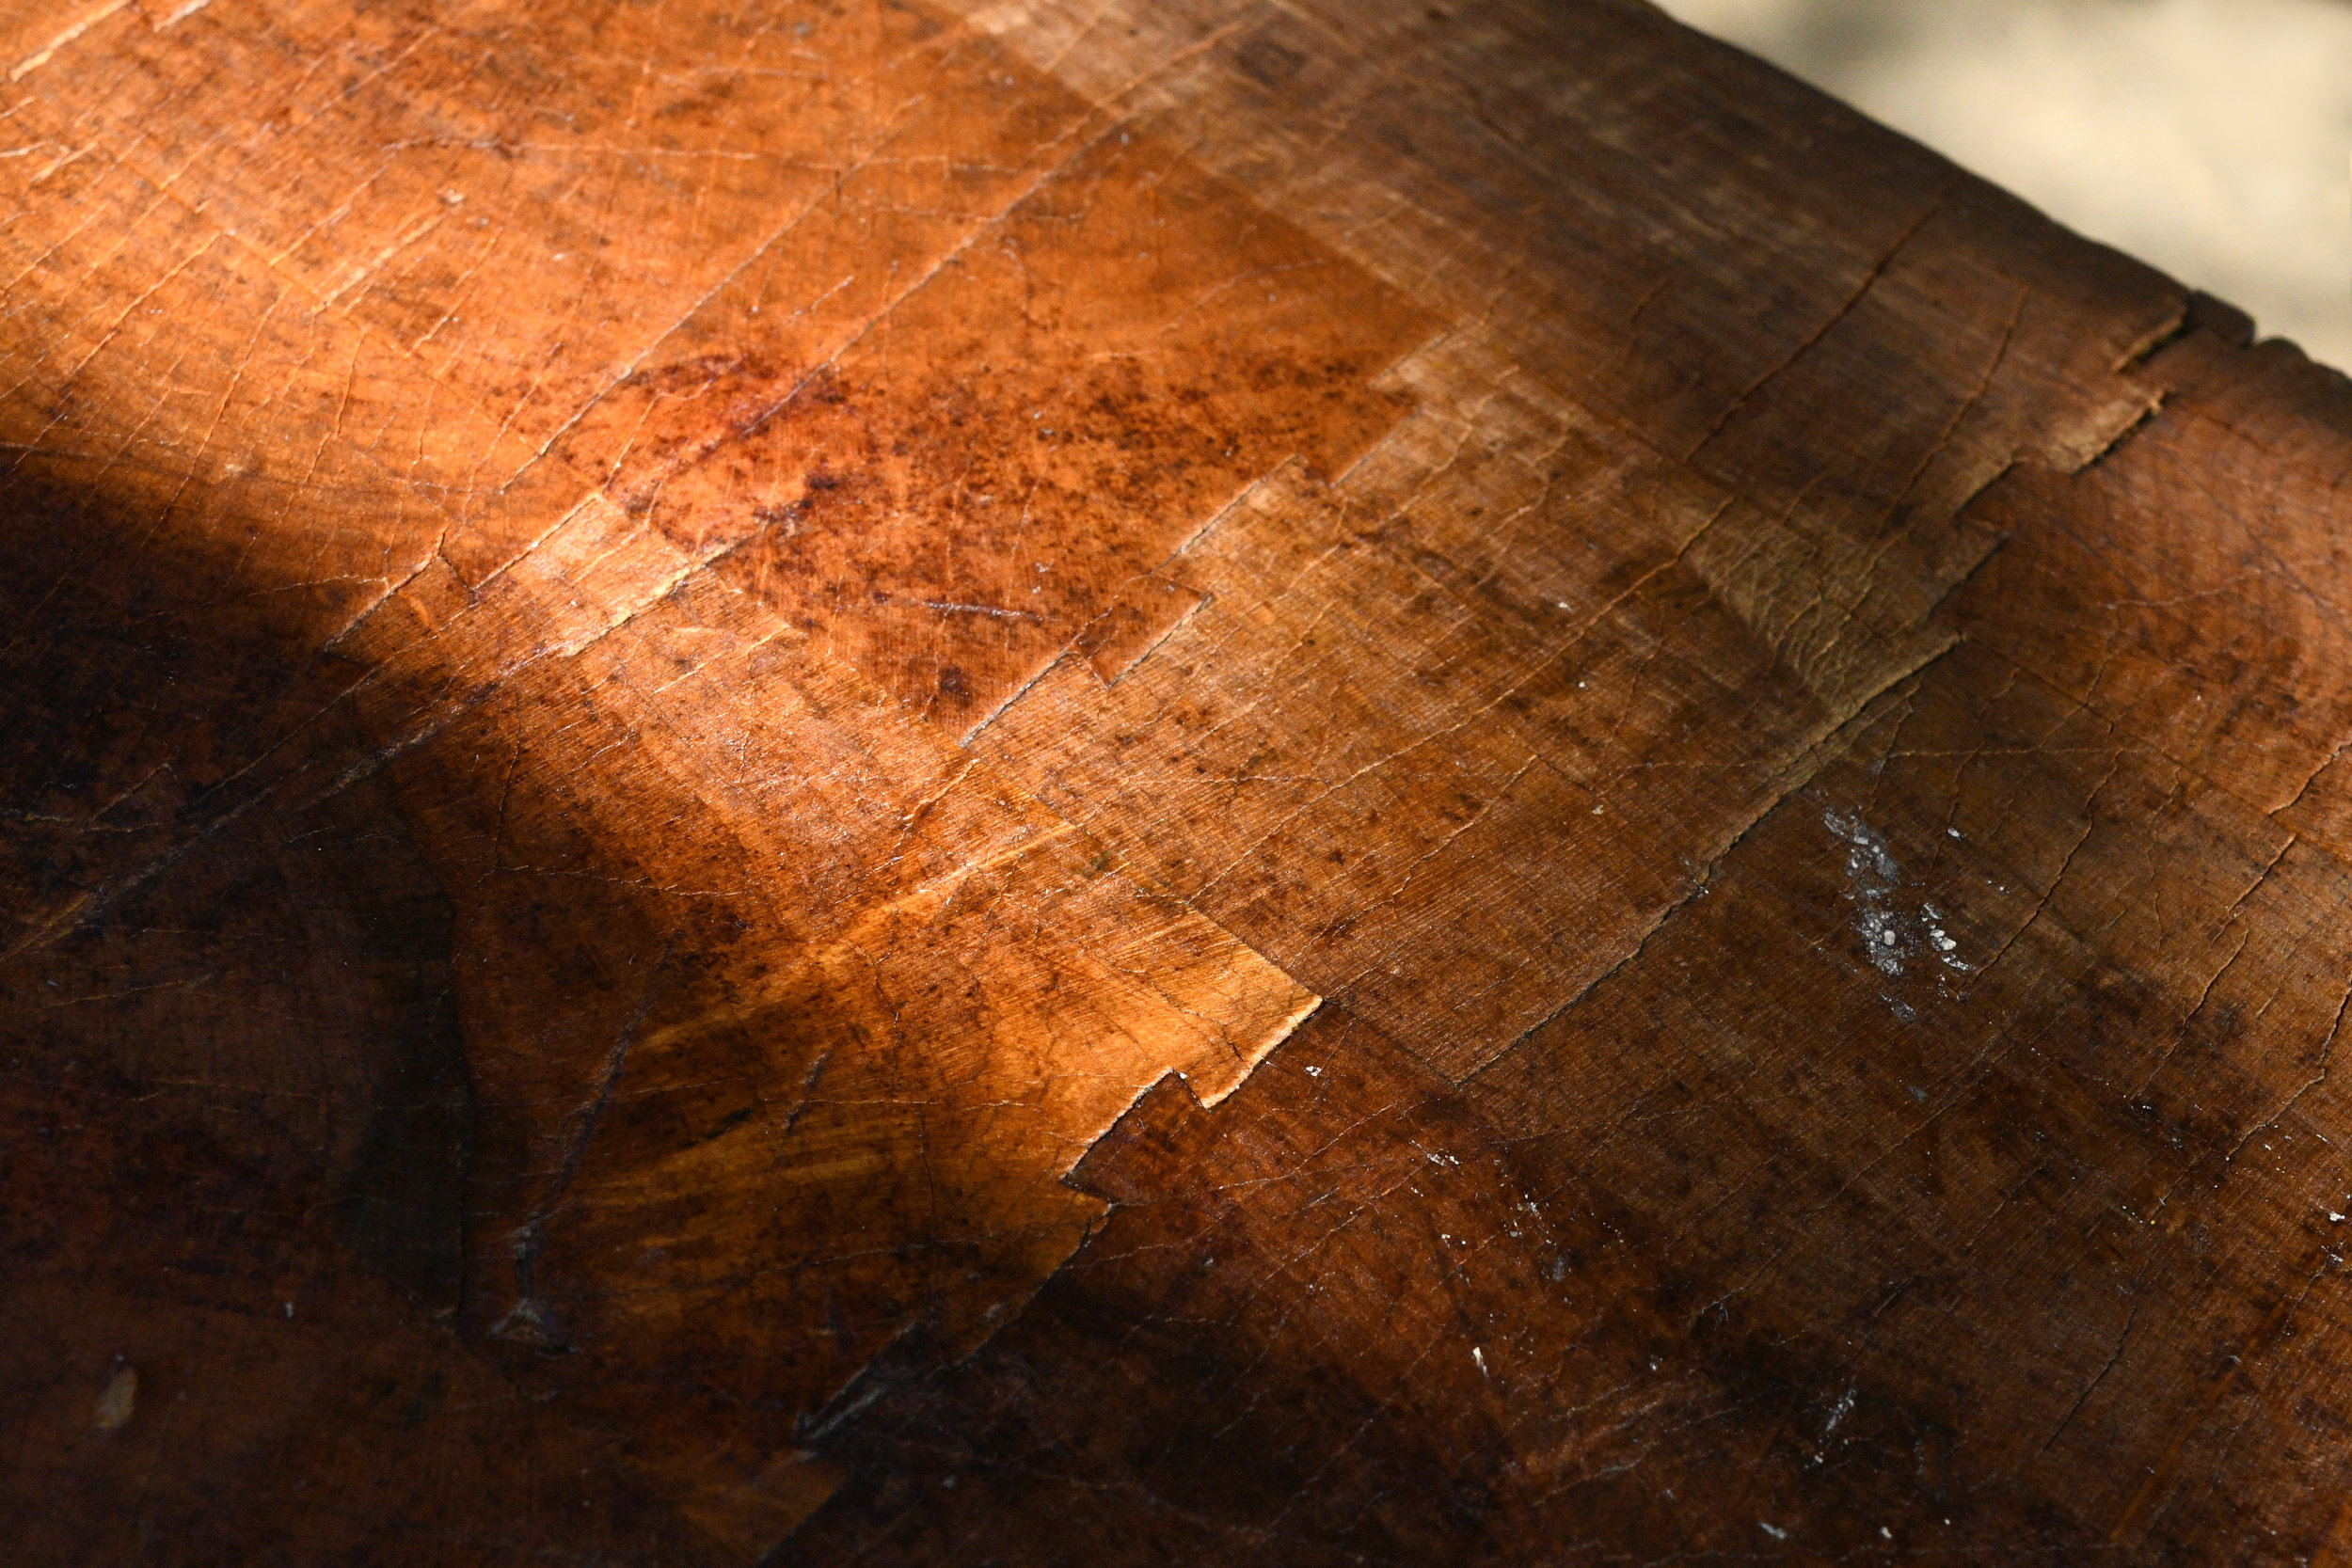 47736-butcher-block-table-wood-grain.jpg